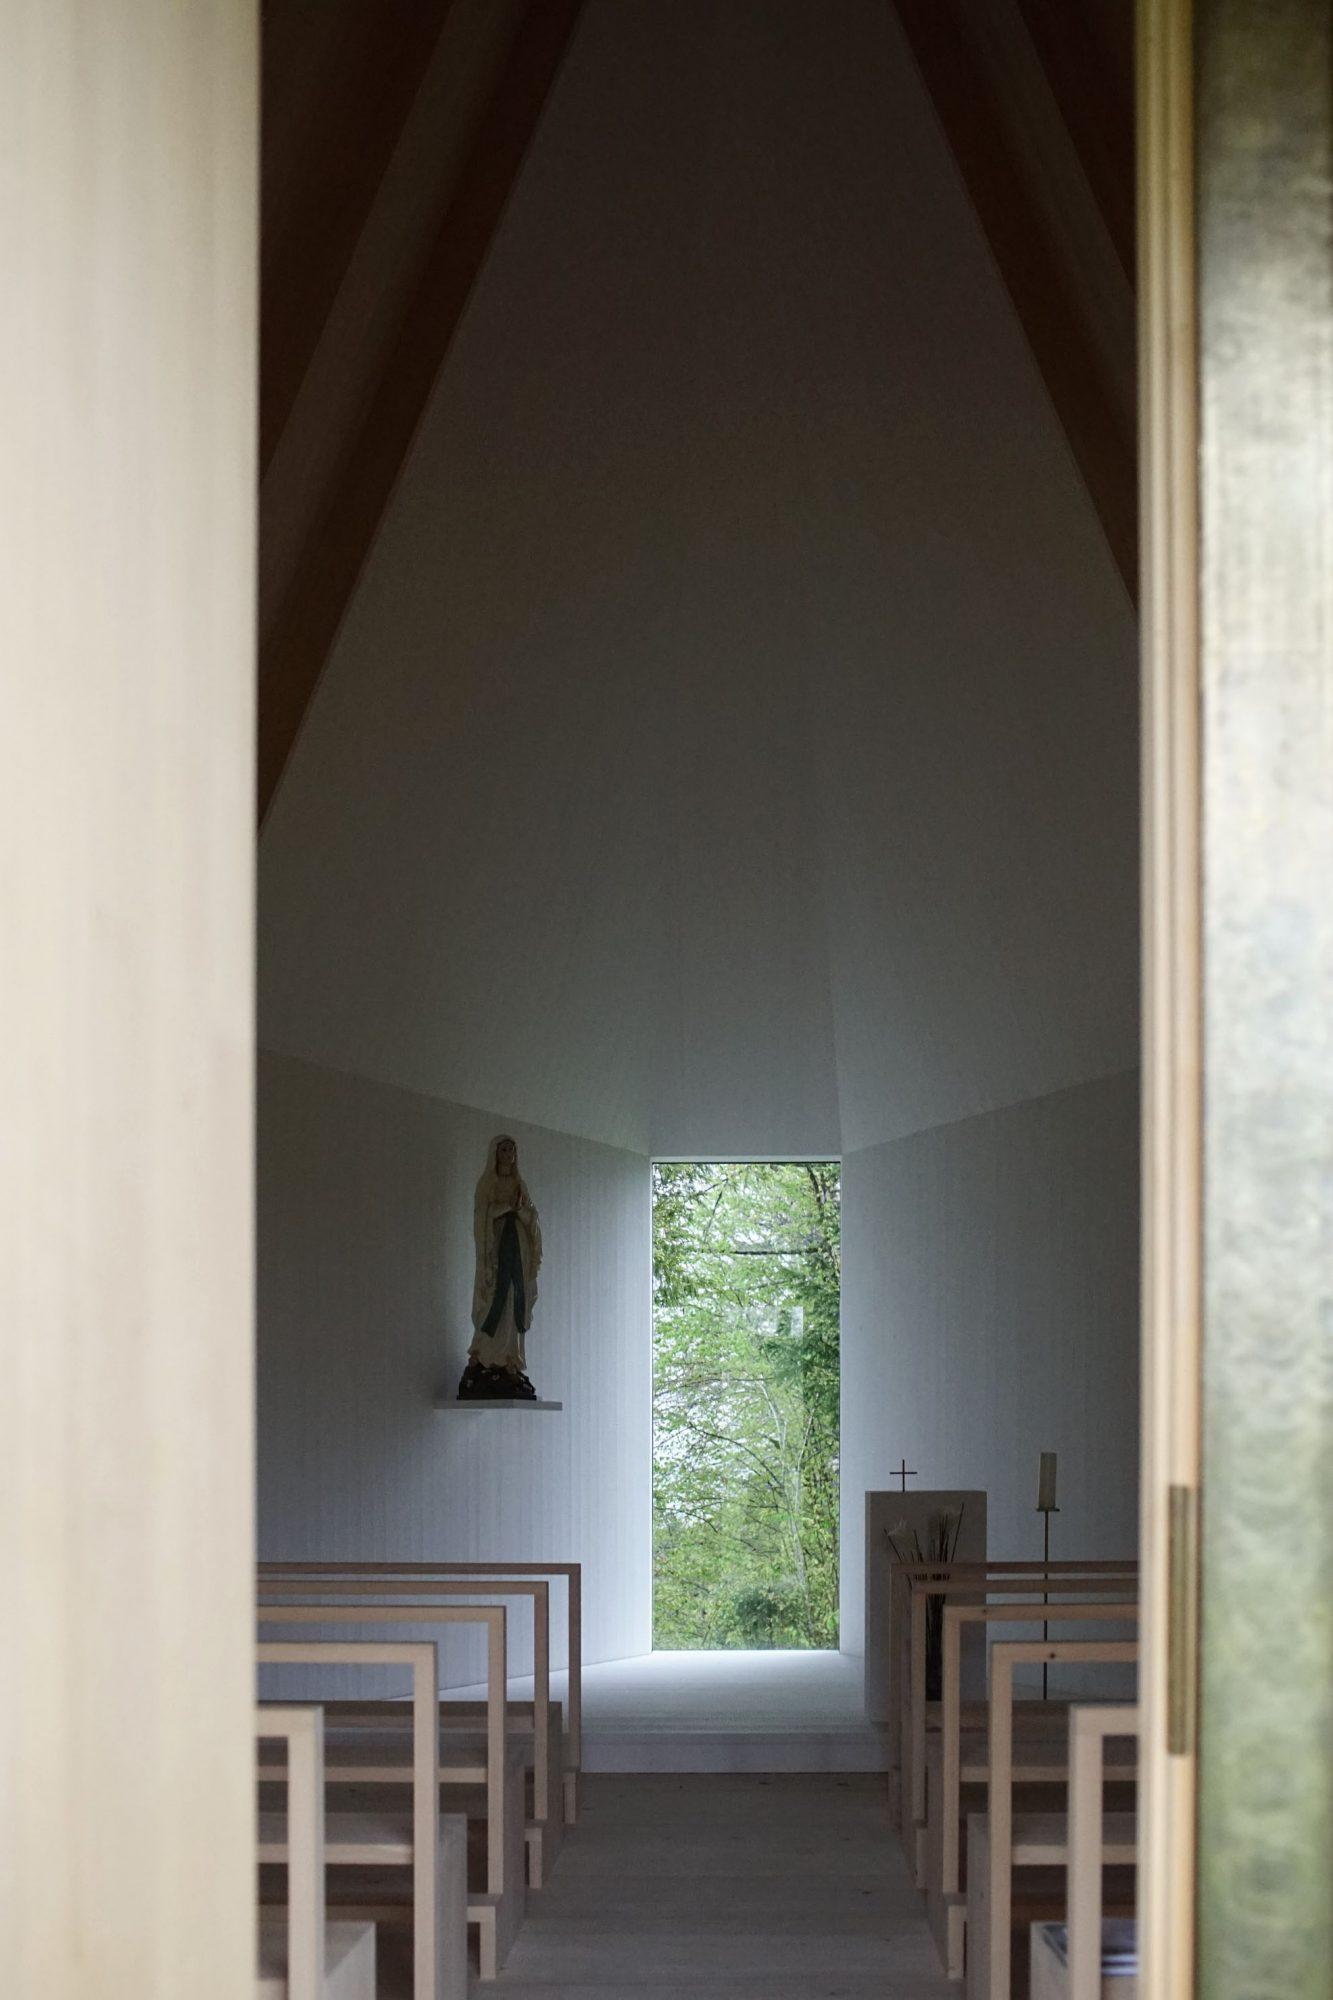 salgenreute-chapel-bernardo-bader-photo-jean-nicolas-lechat-urbantyper-1